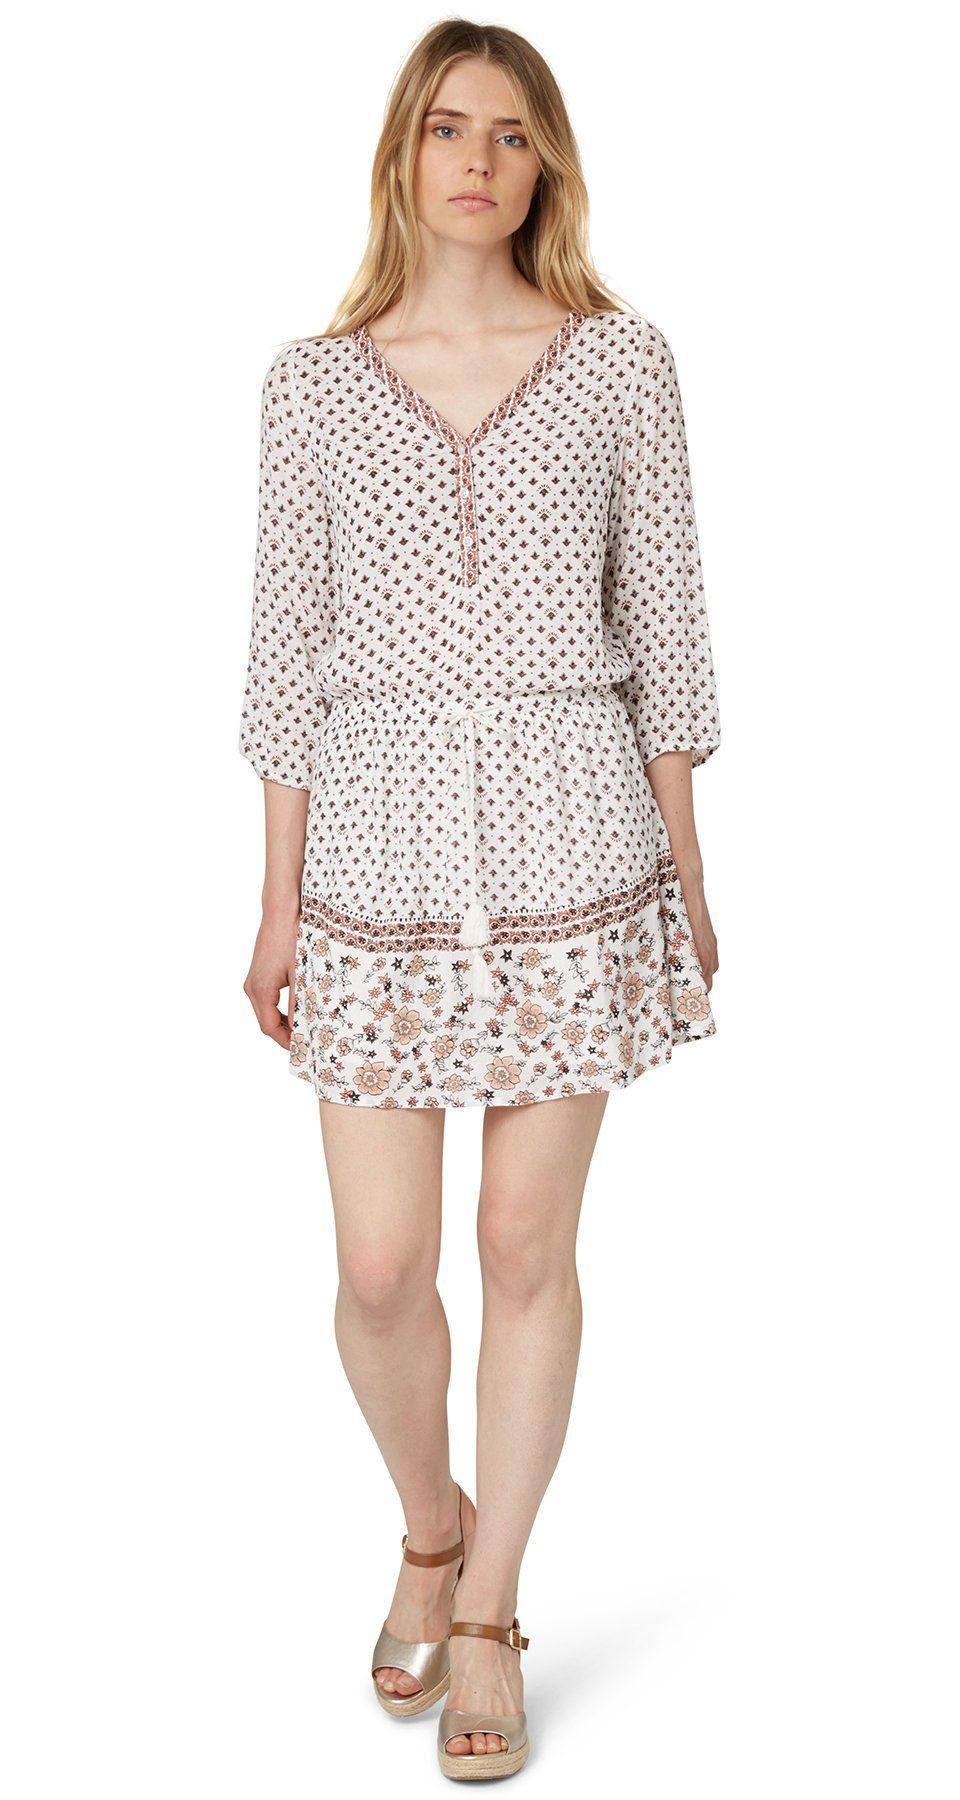 TOM TAILOR DENIM Kleid »Kleid mit floral-gemustertem Saum«